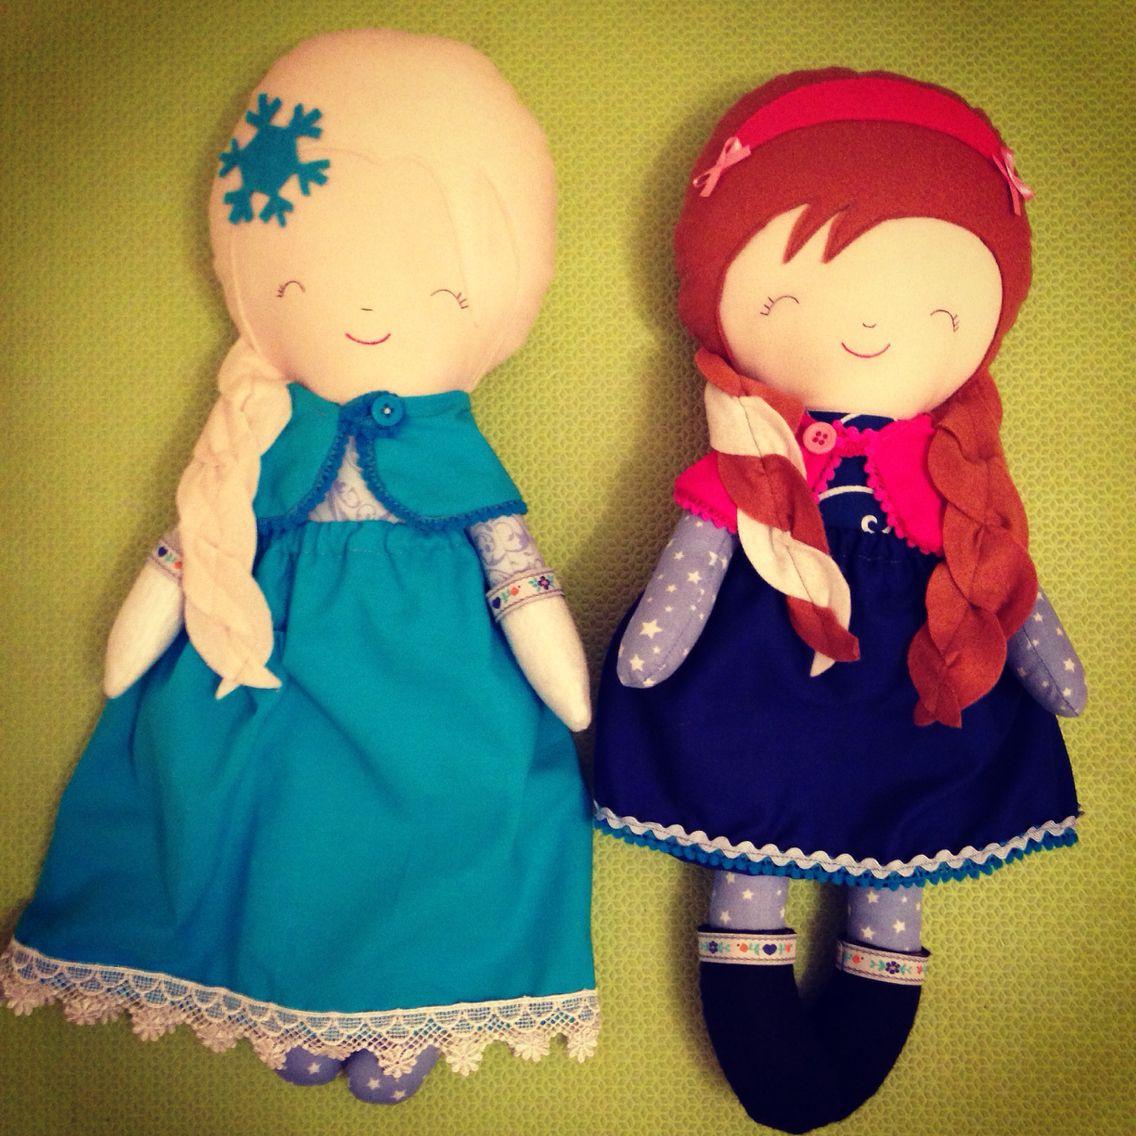 Elsa and Anna! Frozen